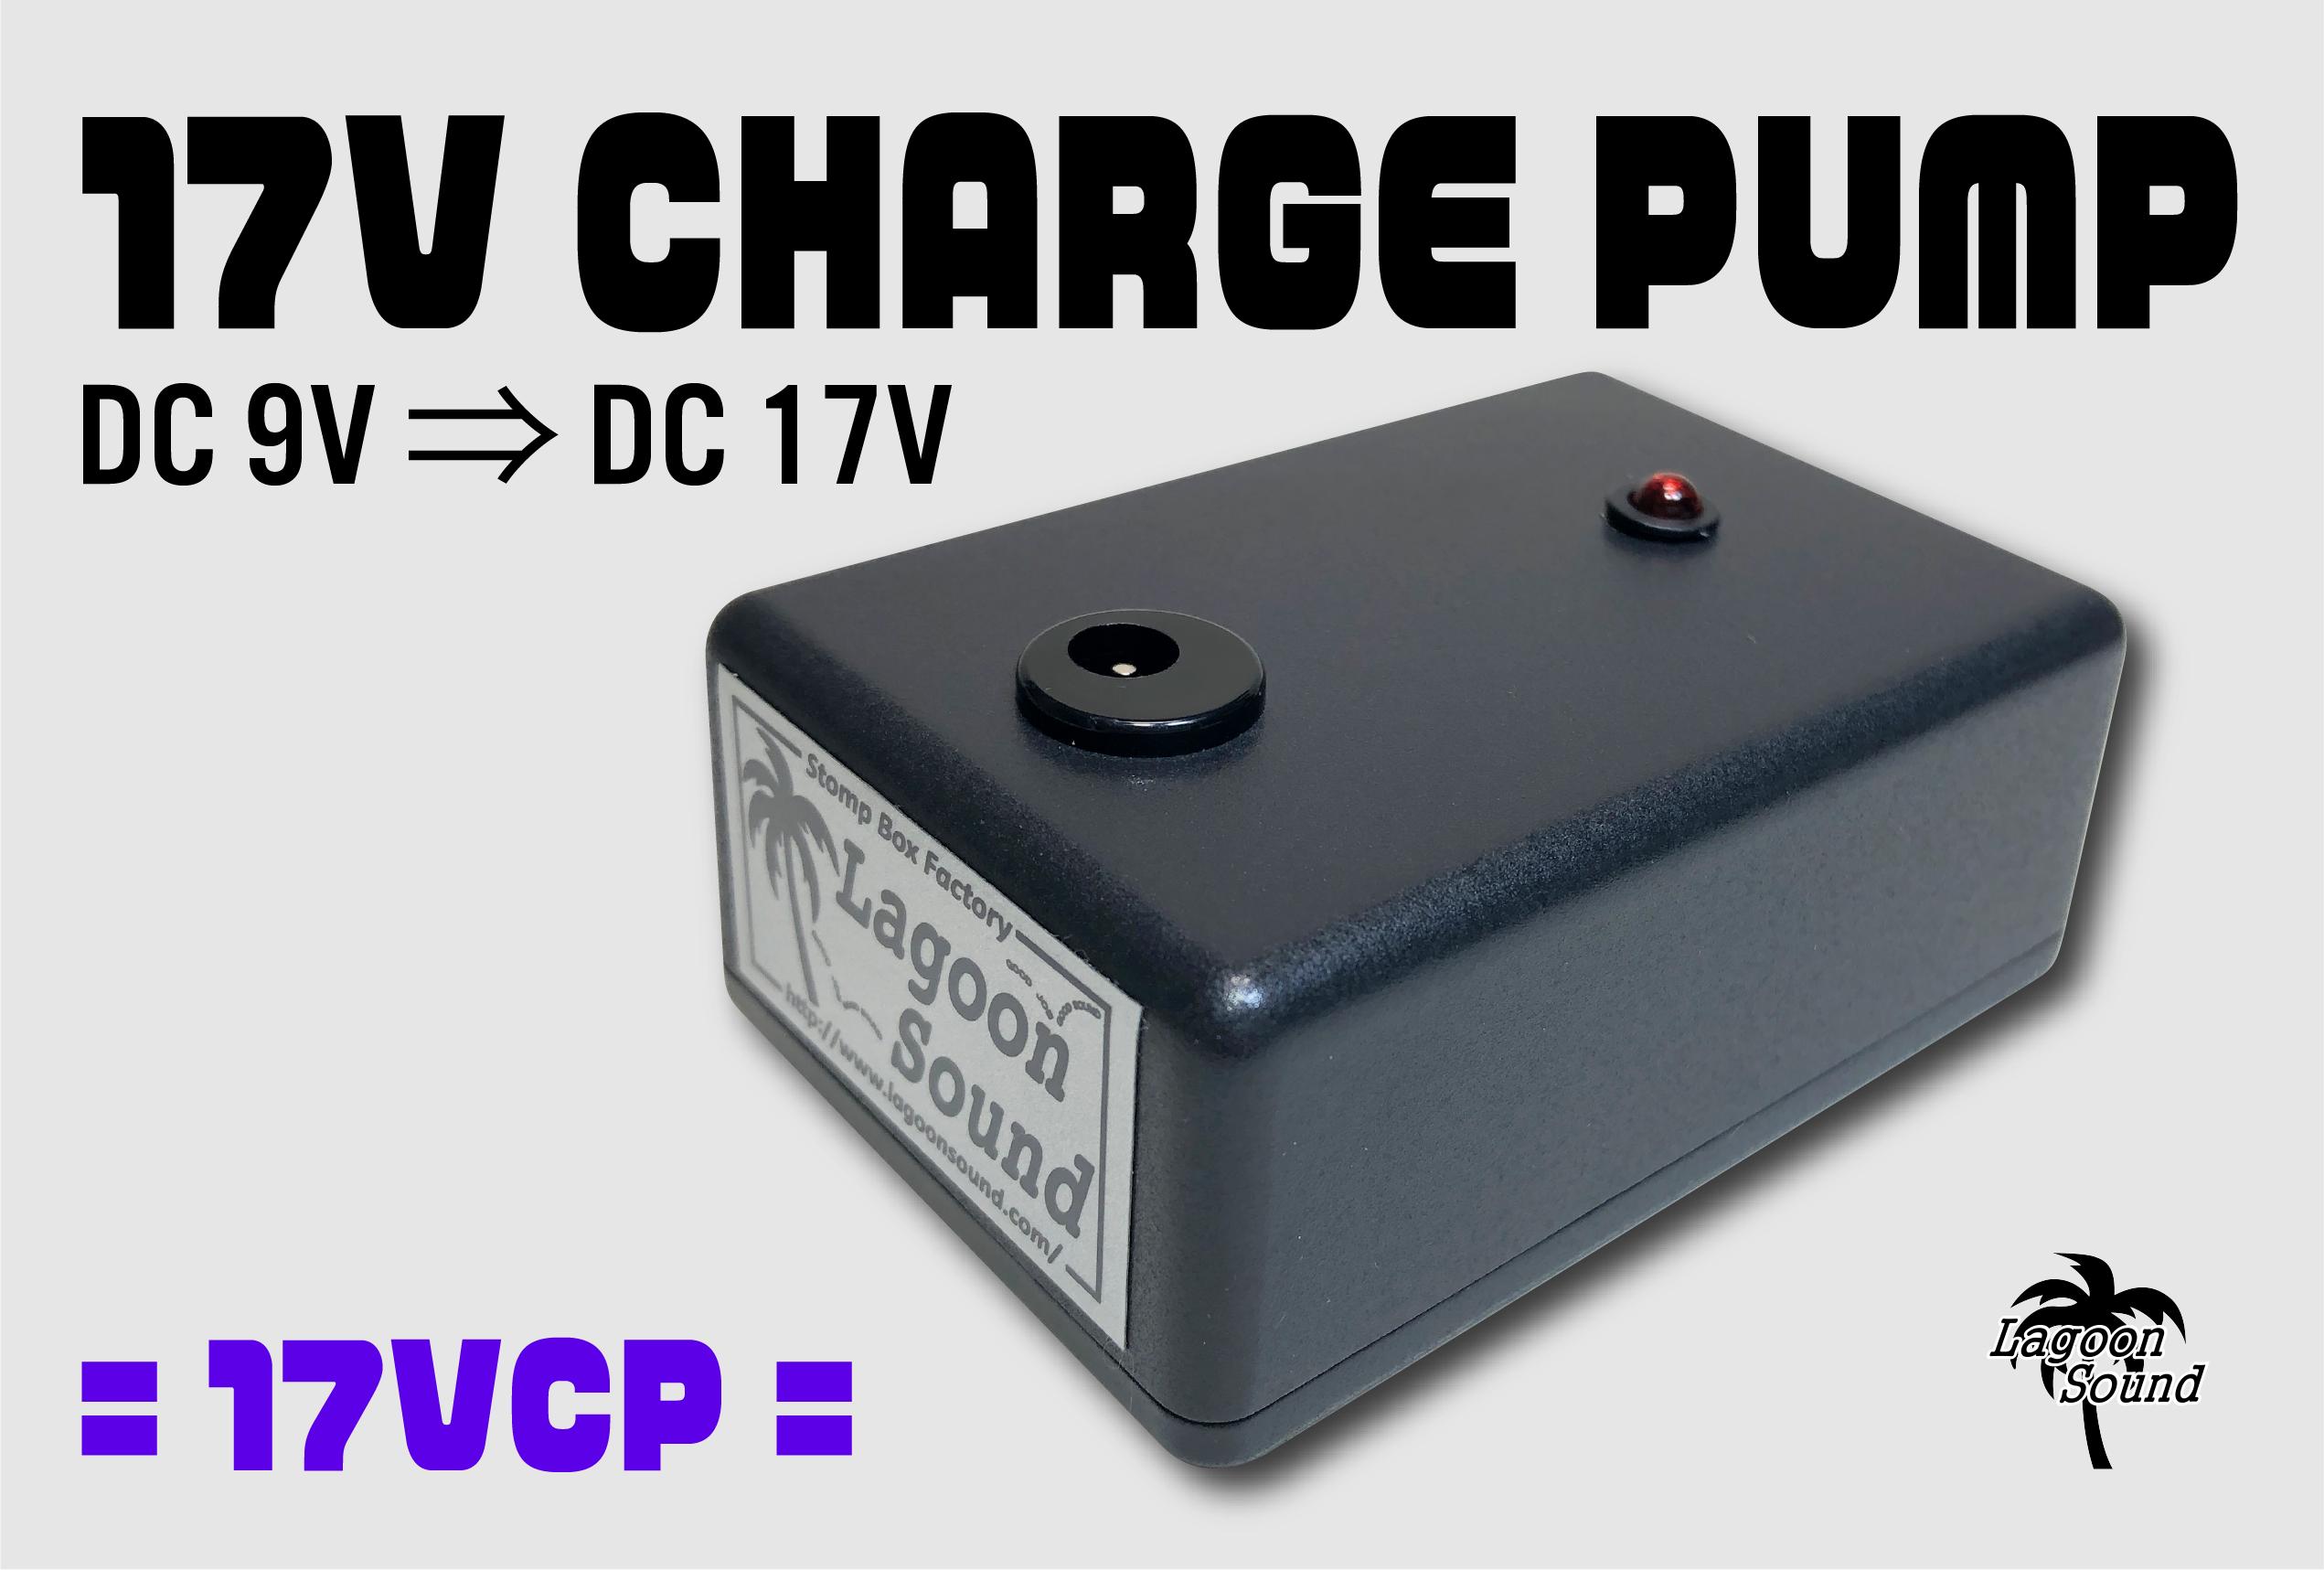 17VCP